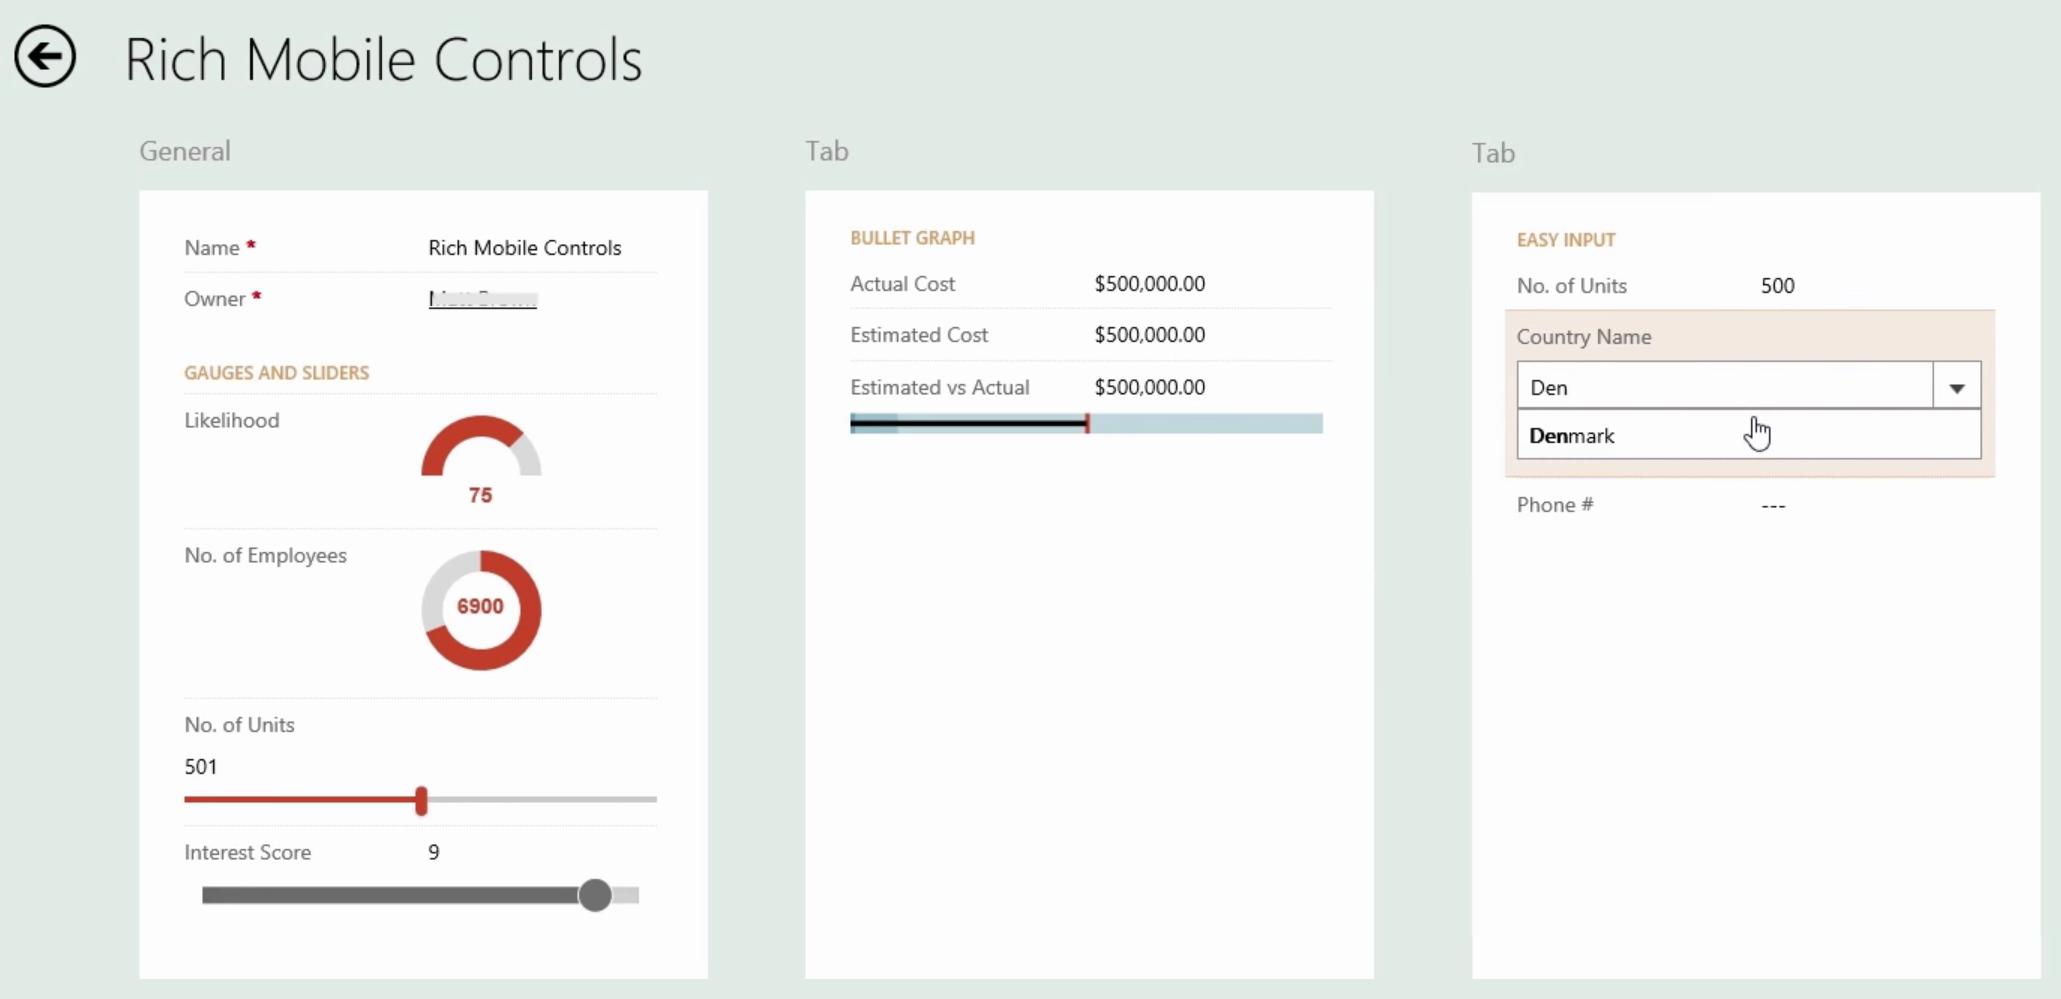 Microsoft Dynamics CRM 2016 Mobile Controls